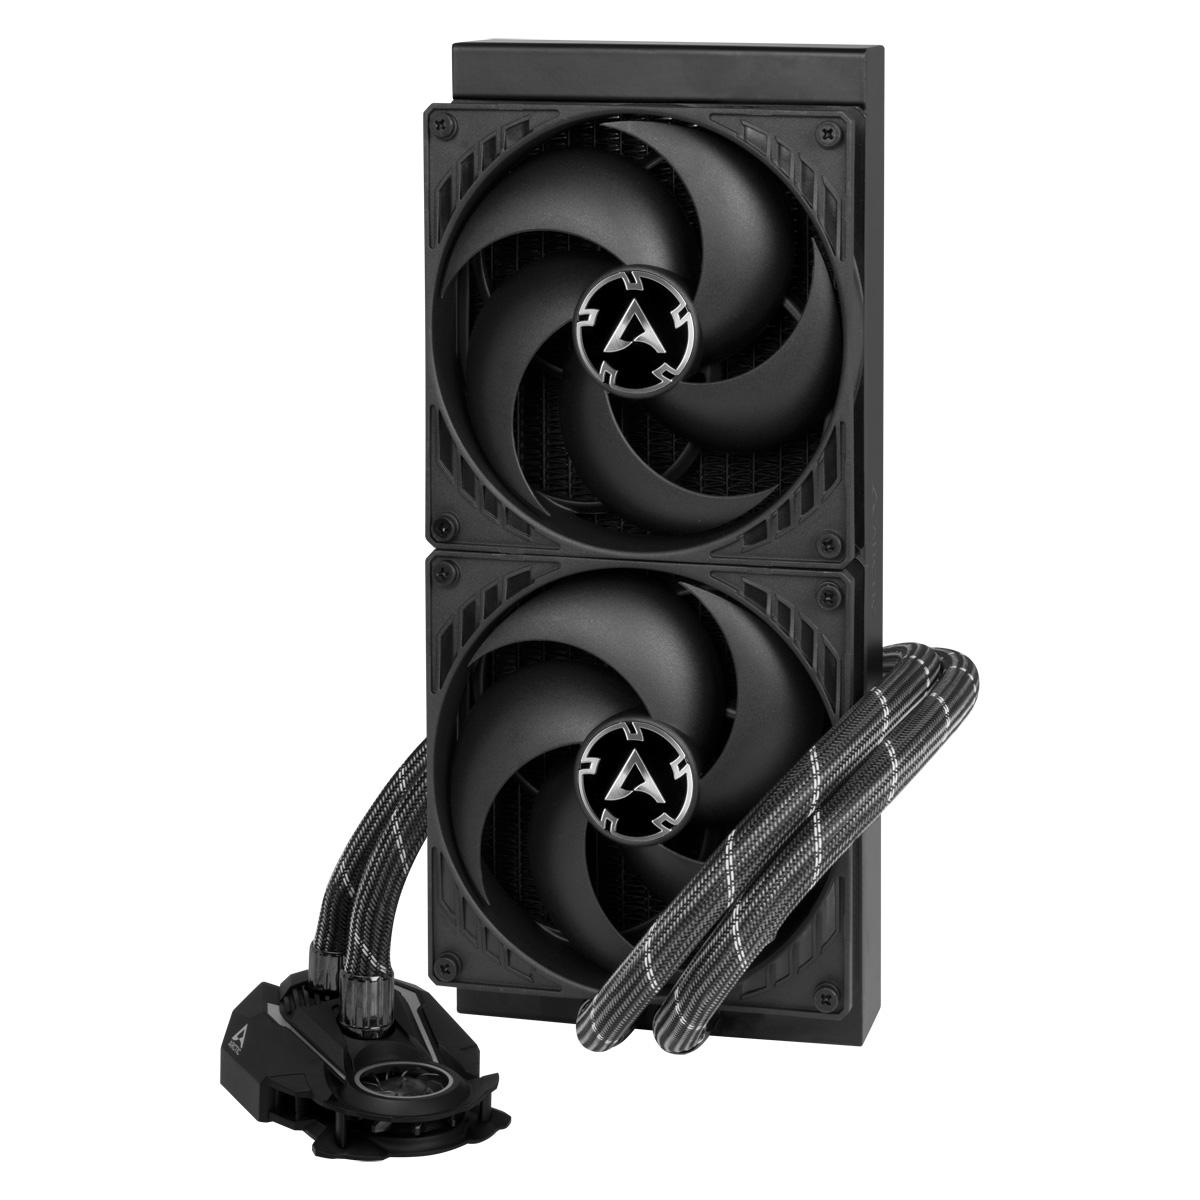 Multi-Compatible AiO CPU Water Cooler ARCTIC Liquid Freezer II 280 Front View